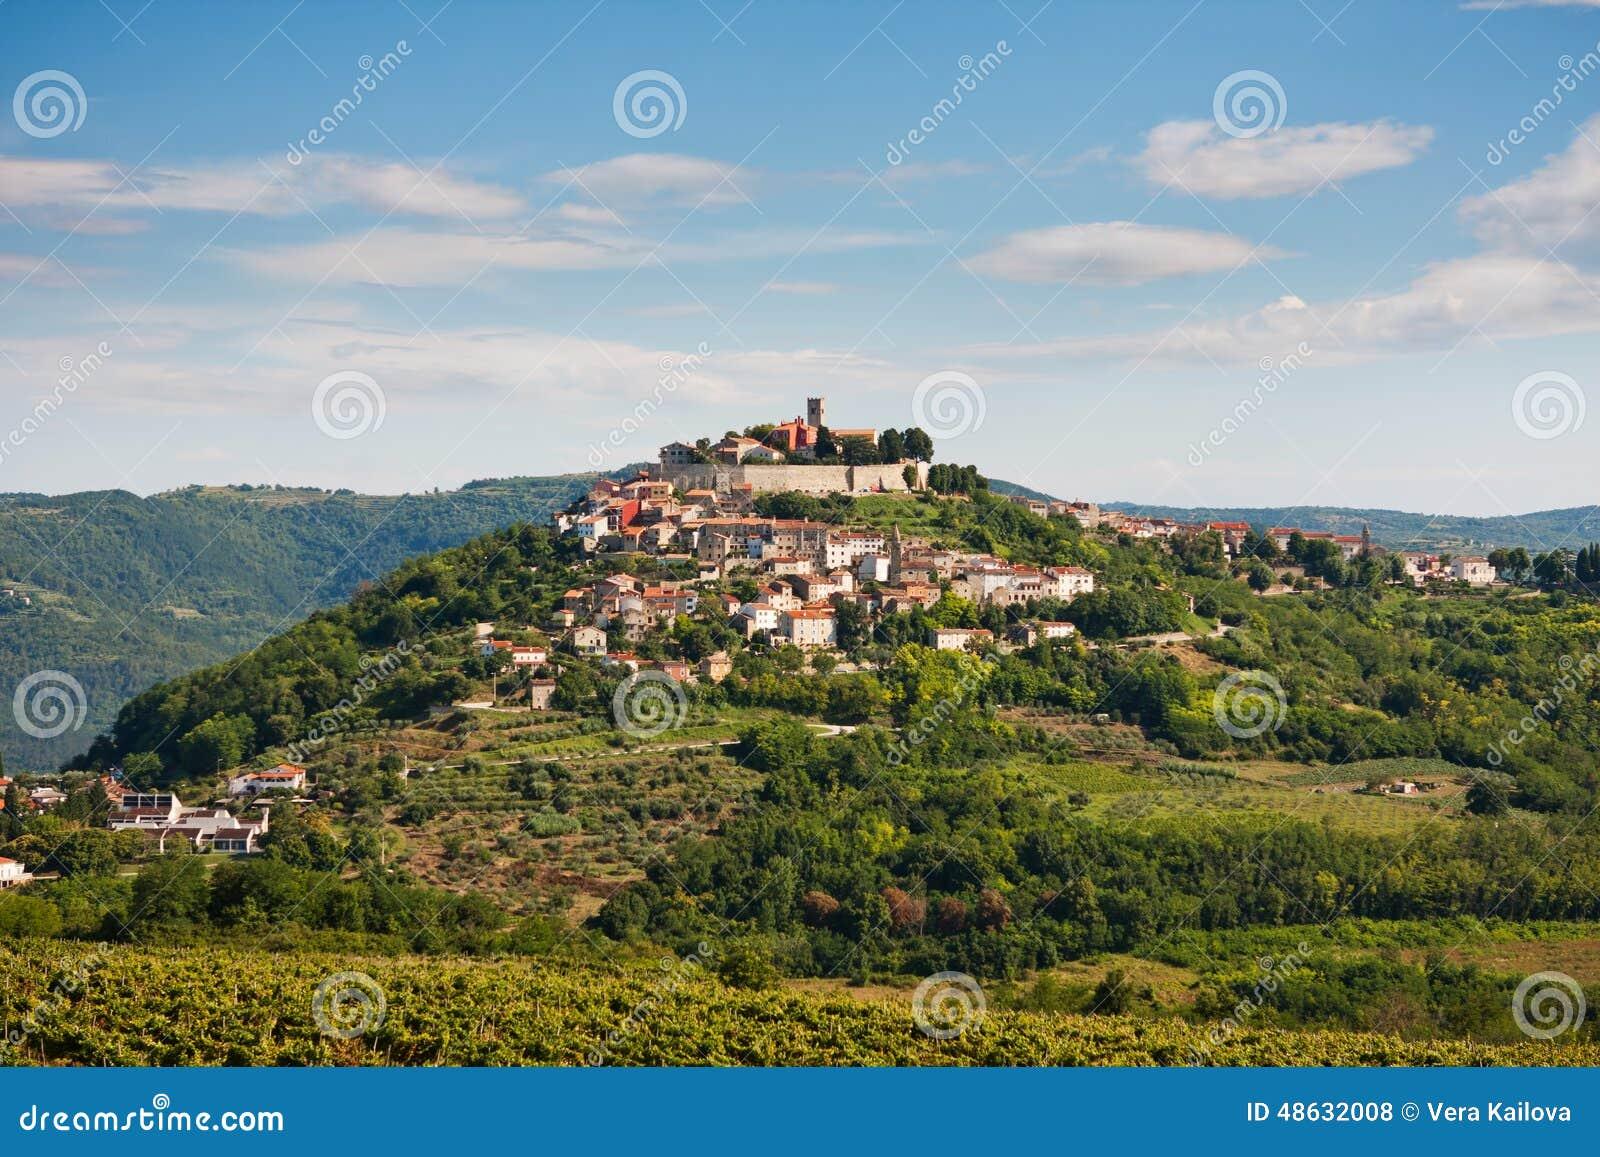 Le village Motovun